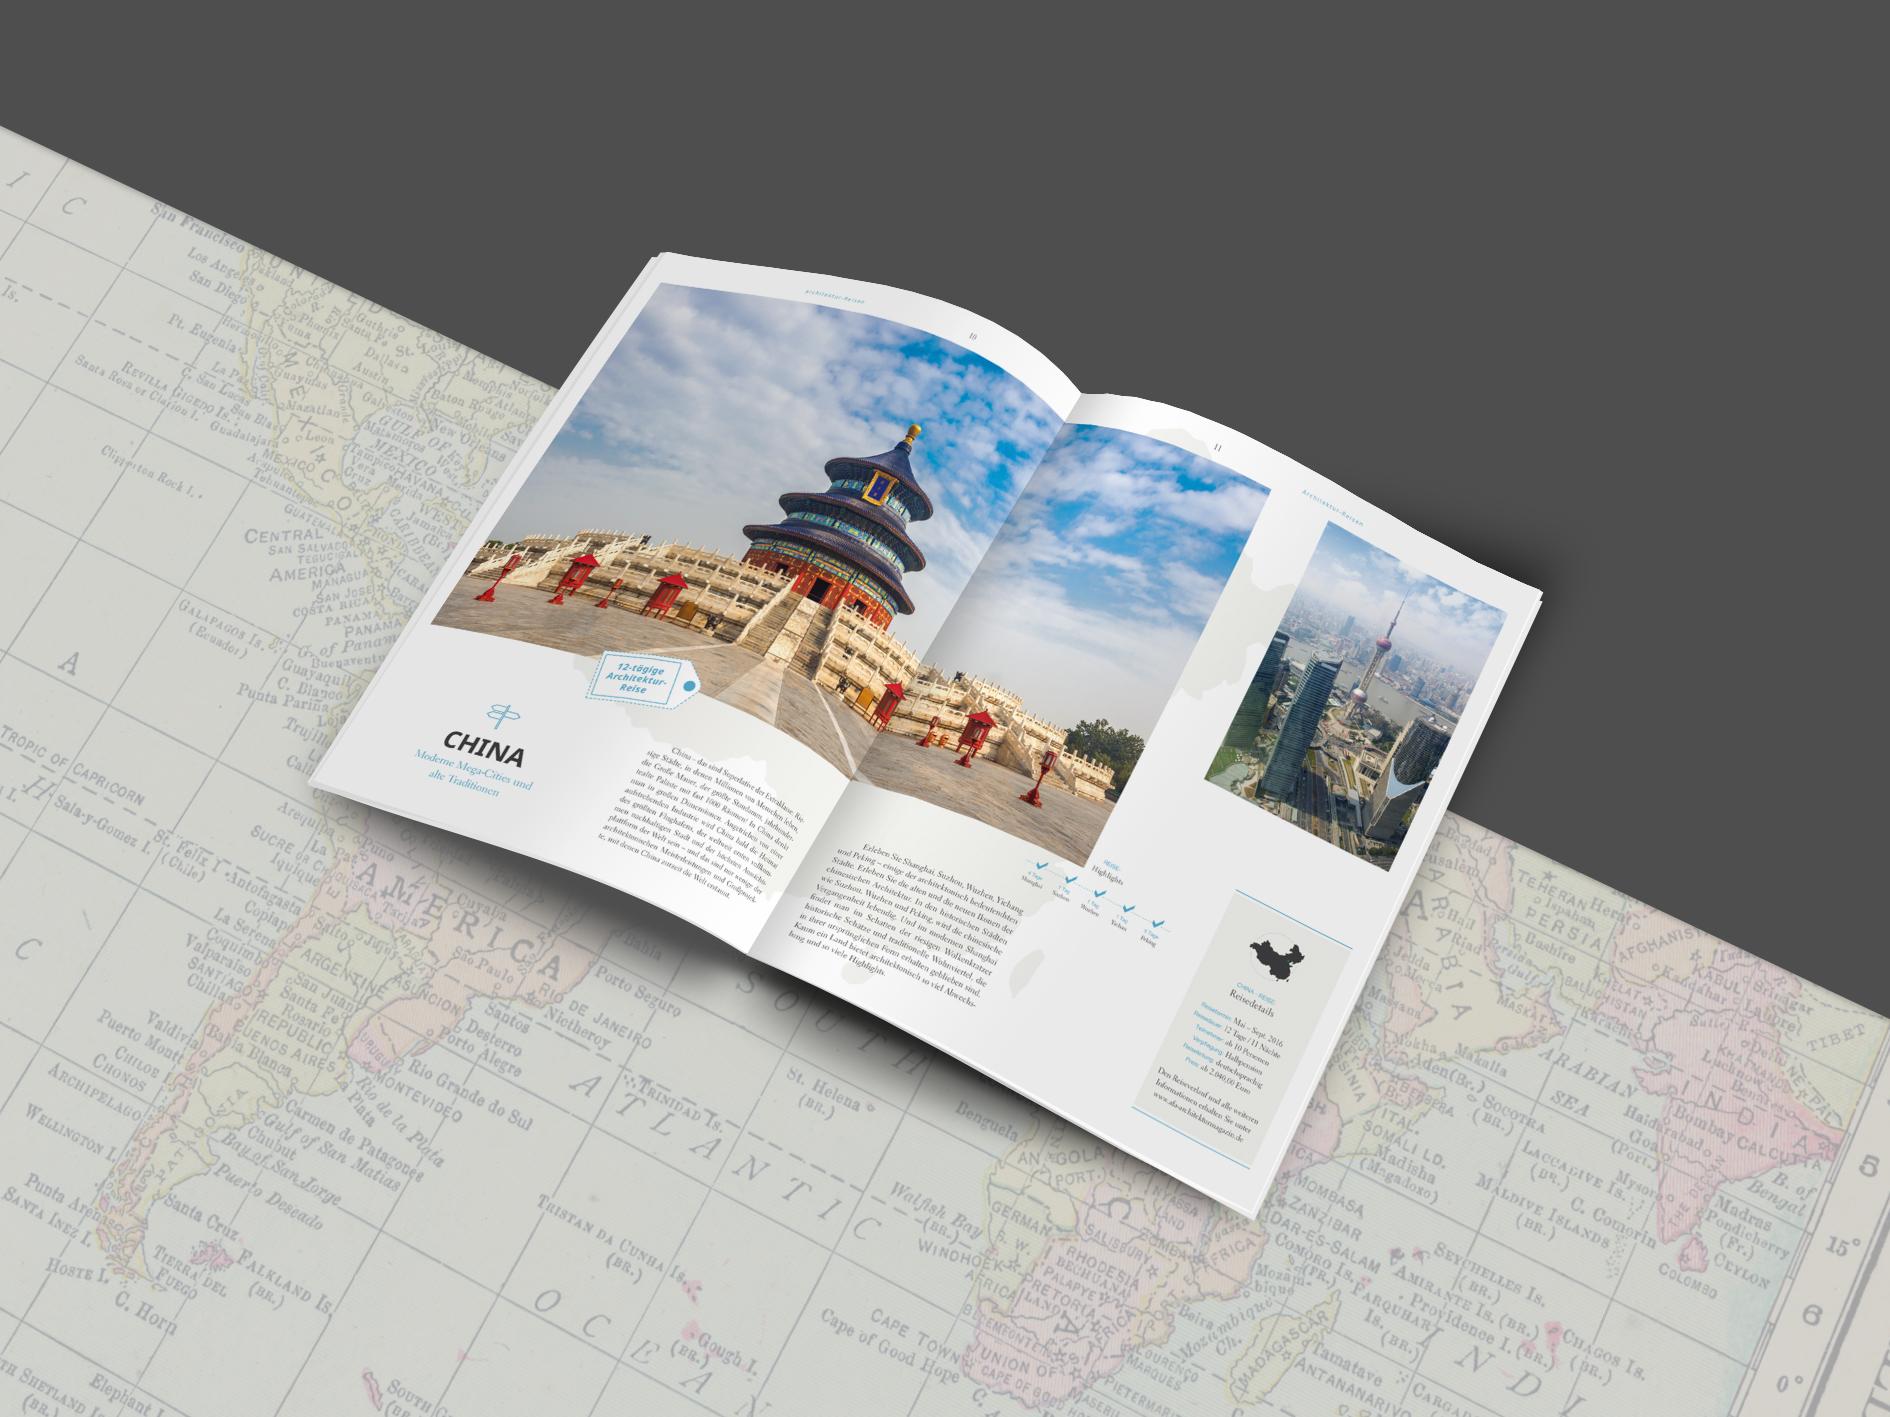 Erfreut Moderne Architektur Magazin Bilder - Images for ...